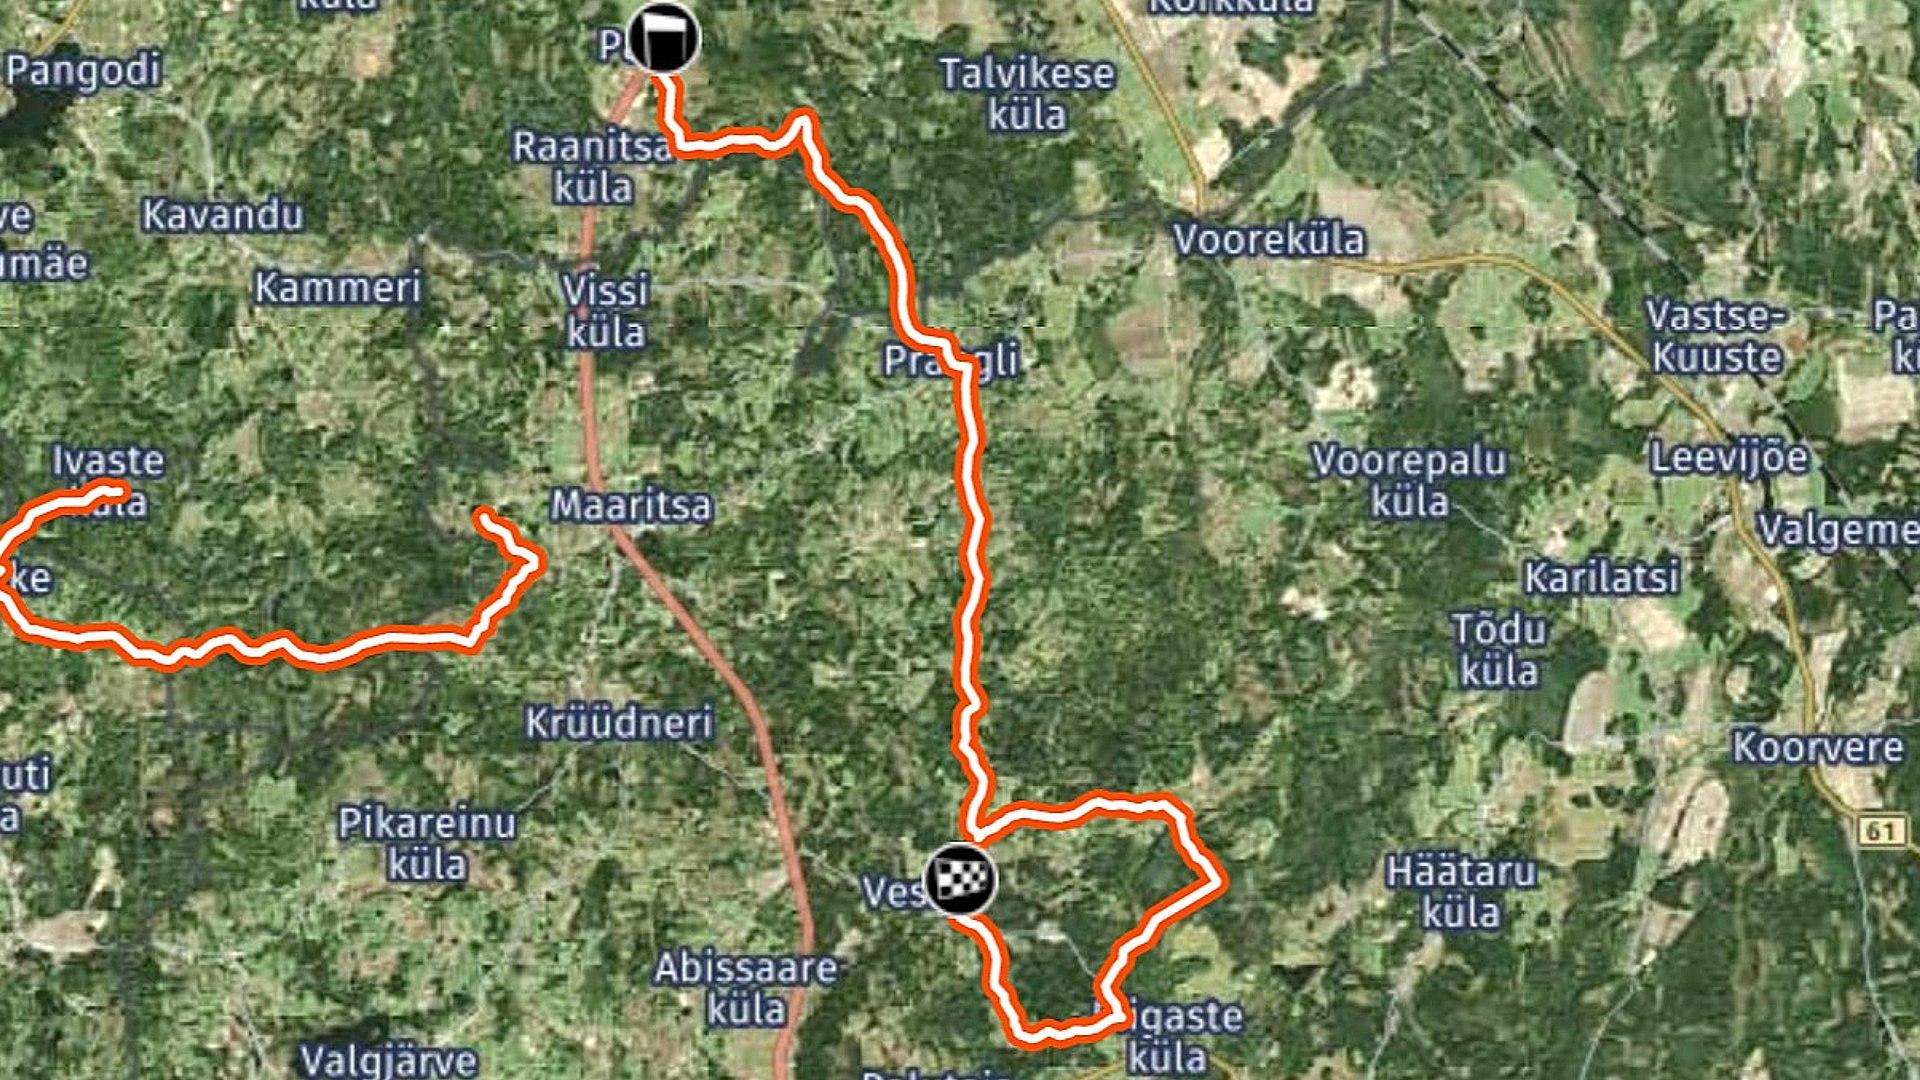 WRC: 11º Rally Estonia [15-18 Julio] - Página 2 170721_WRC-SS12-SS16-Estonia-2021